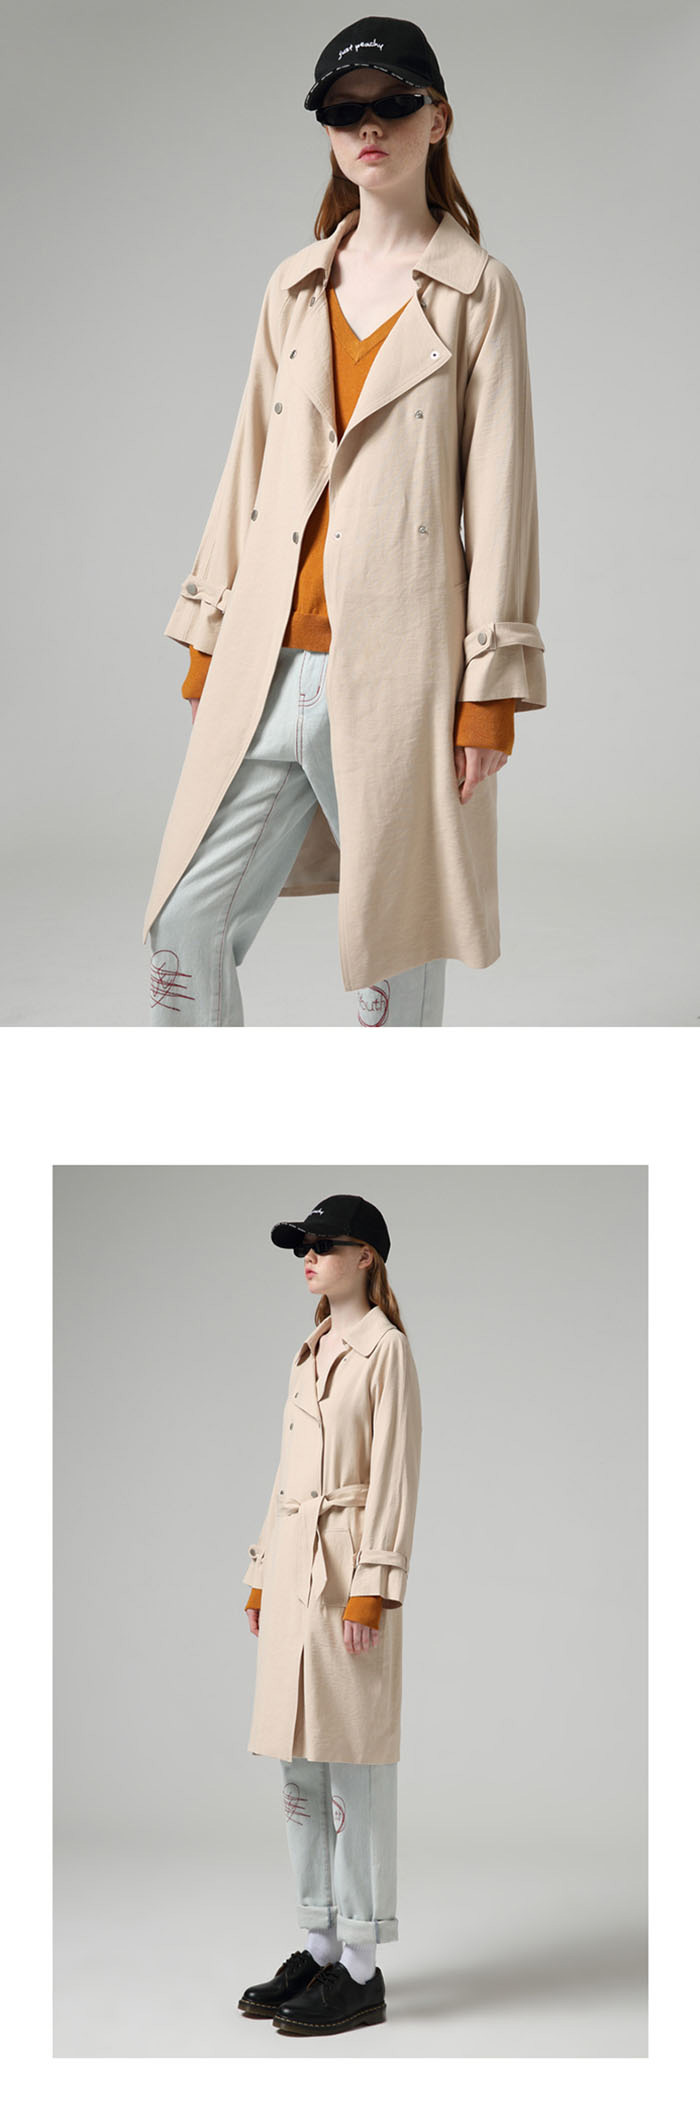 Toyouth Estilo Britânico Mulheres Blusão Sólida Moda